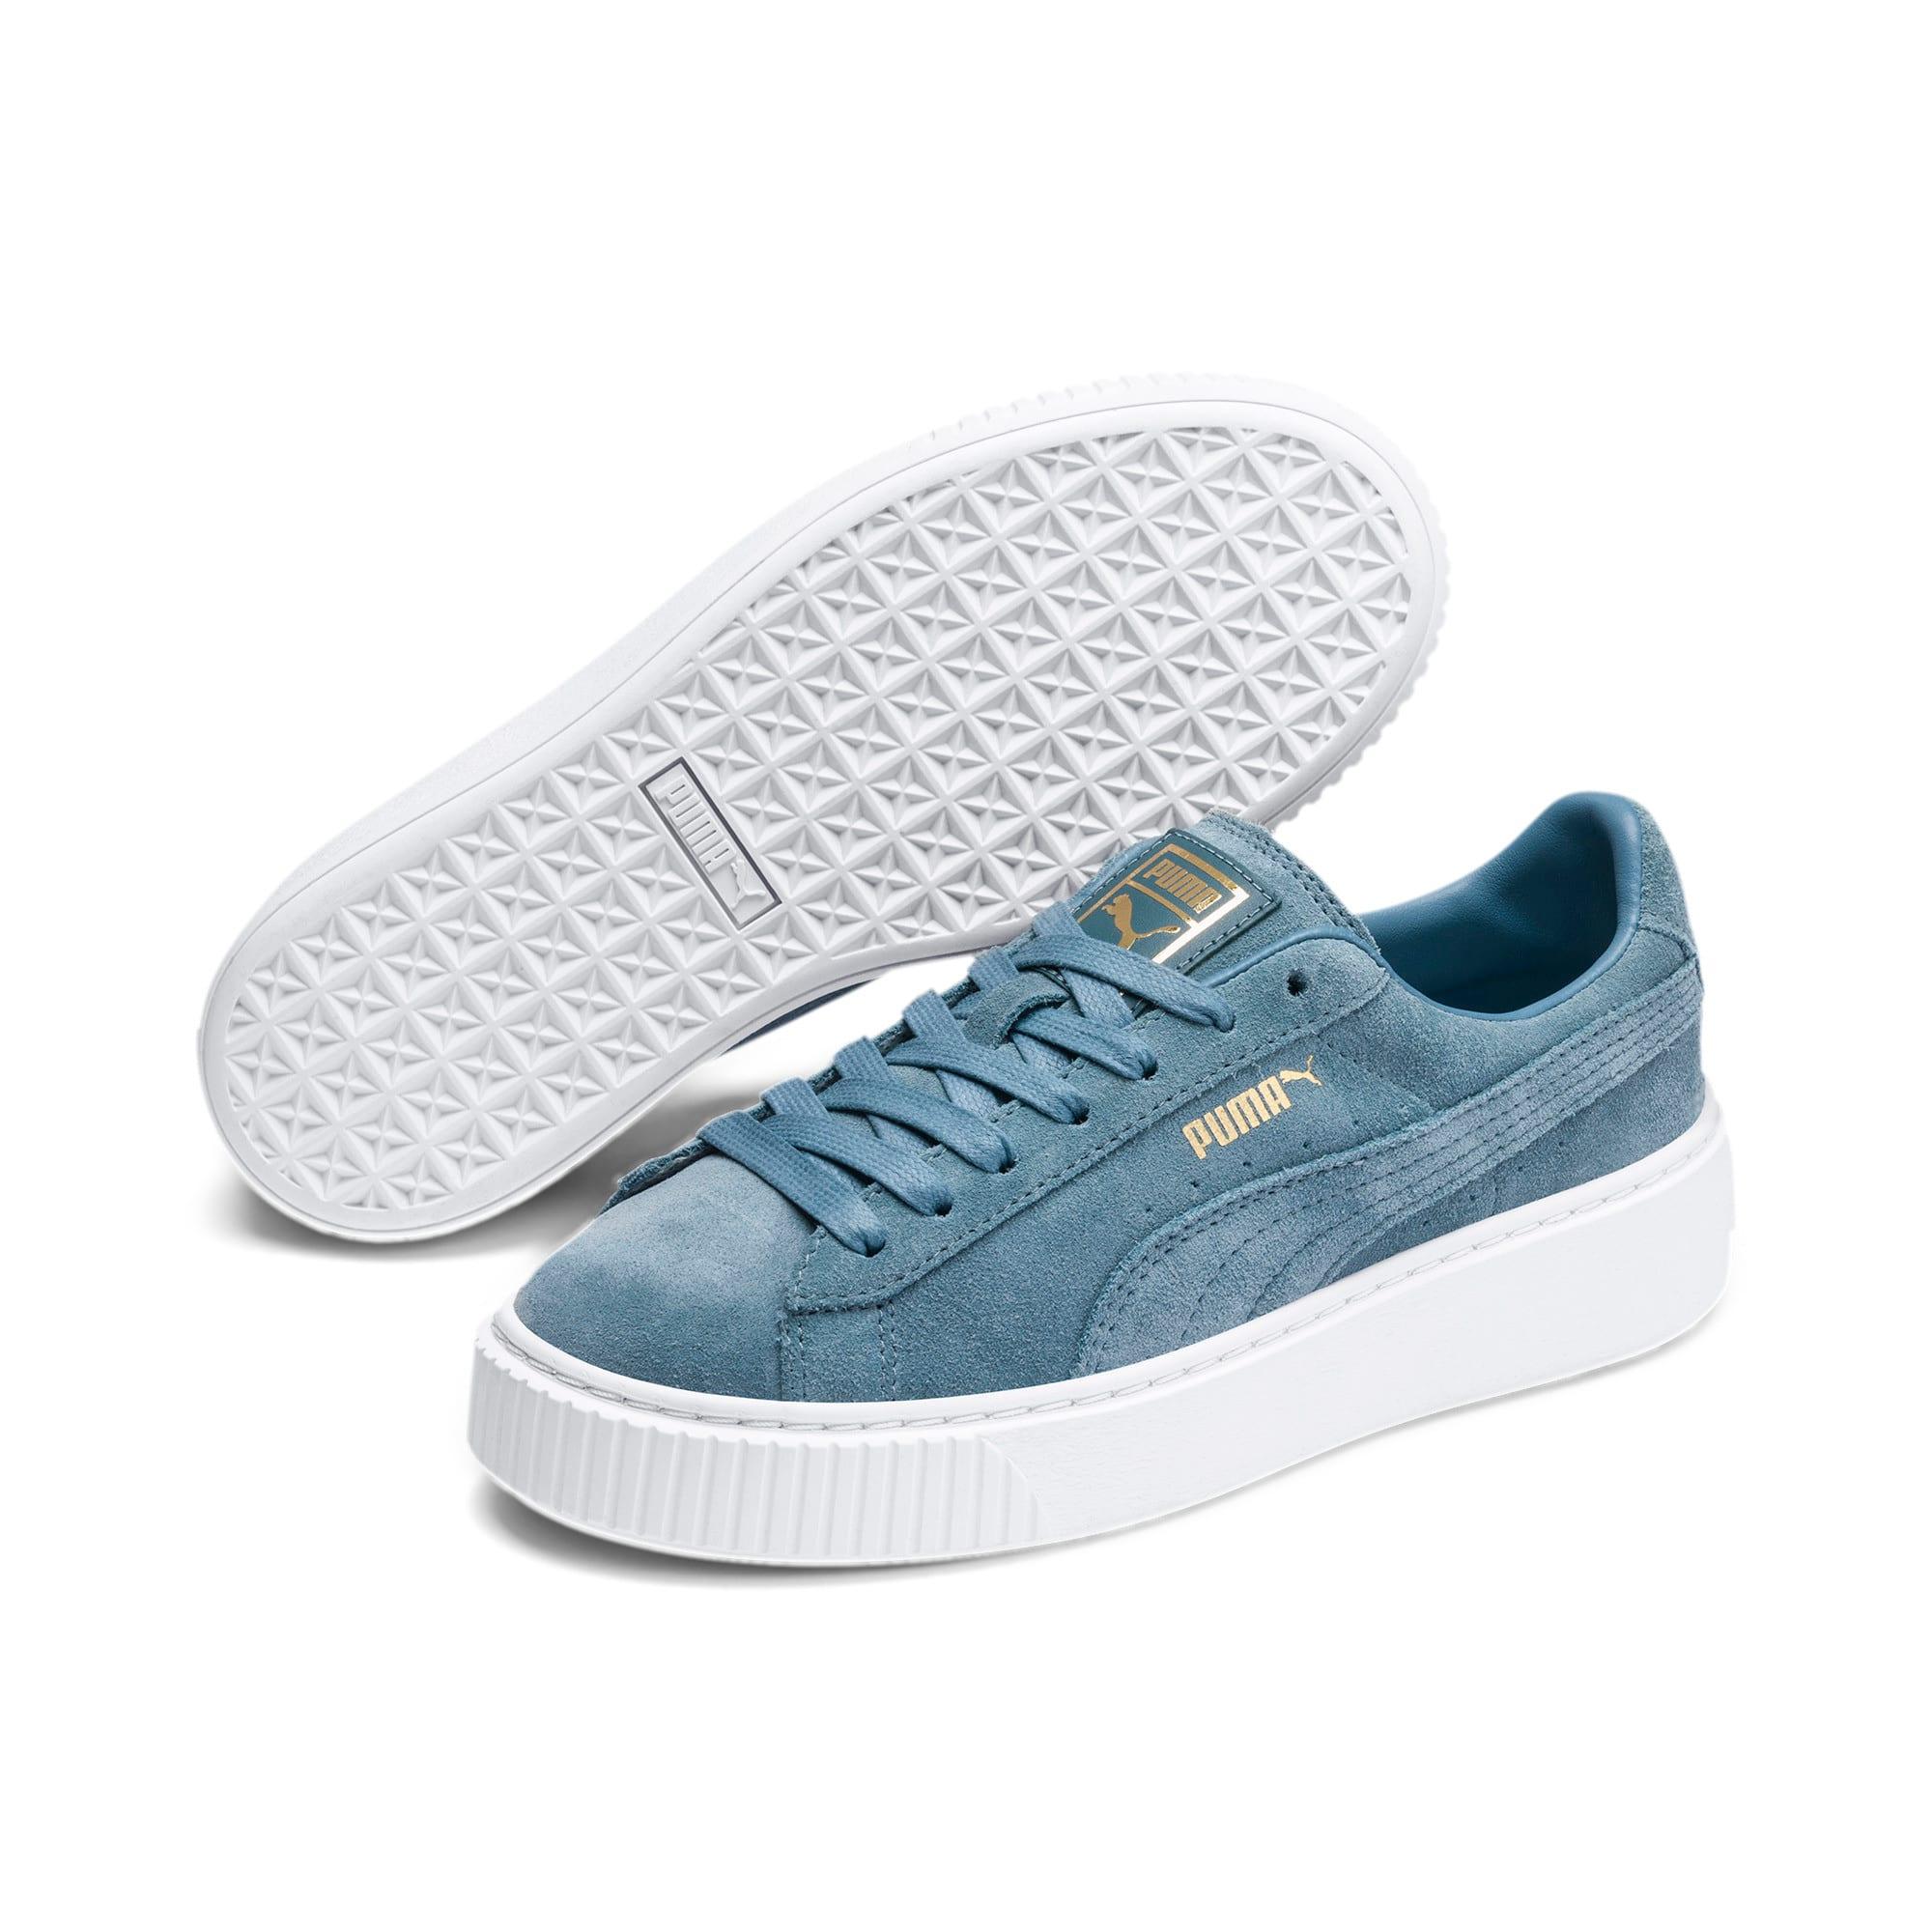 Thumbnail 2 of Suede Platform Women's Sneakers, Bluestone-Puma Team Gold, medium